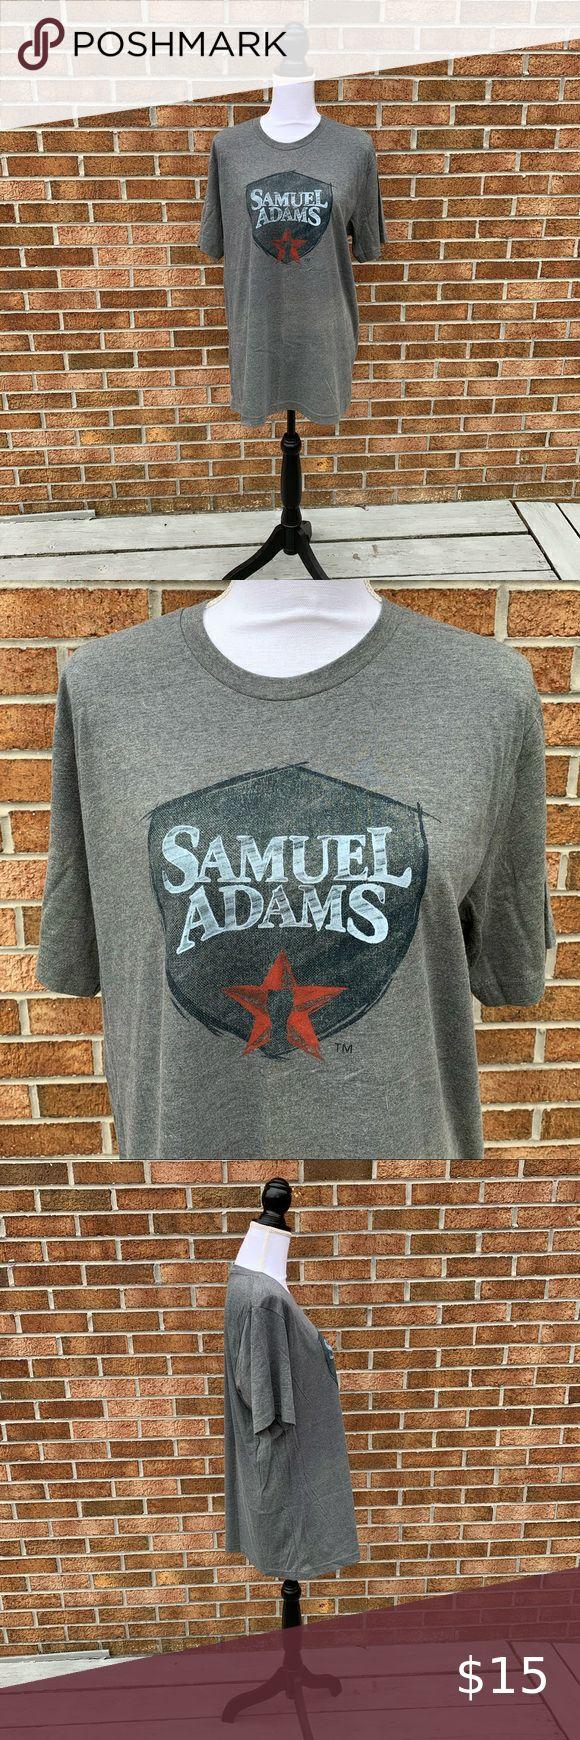 New Samuel Adams Beer Shirt Sam Adams Size XL in 2020